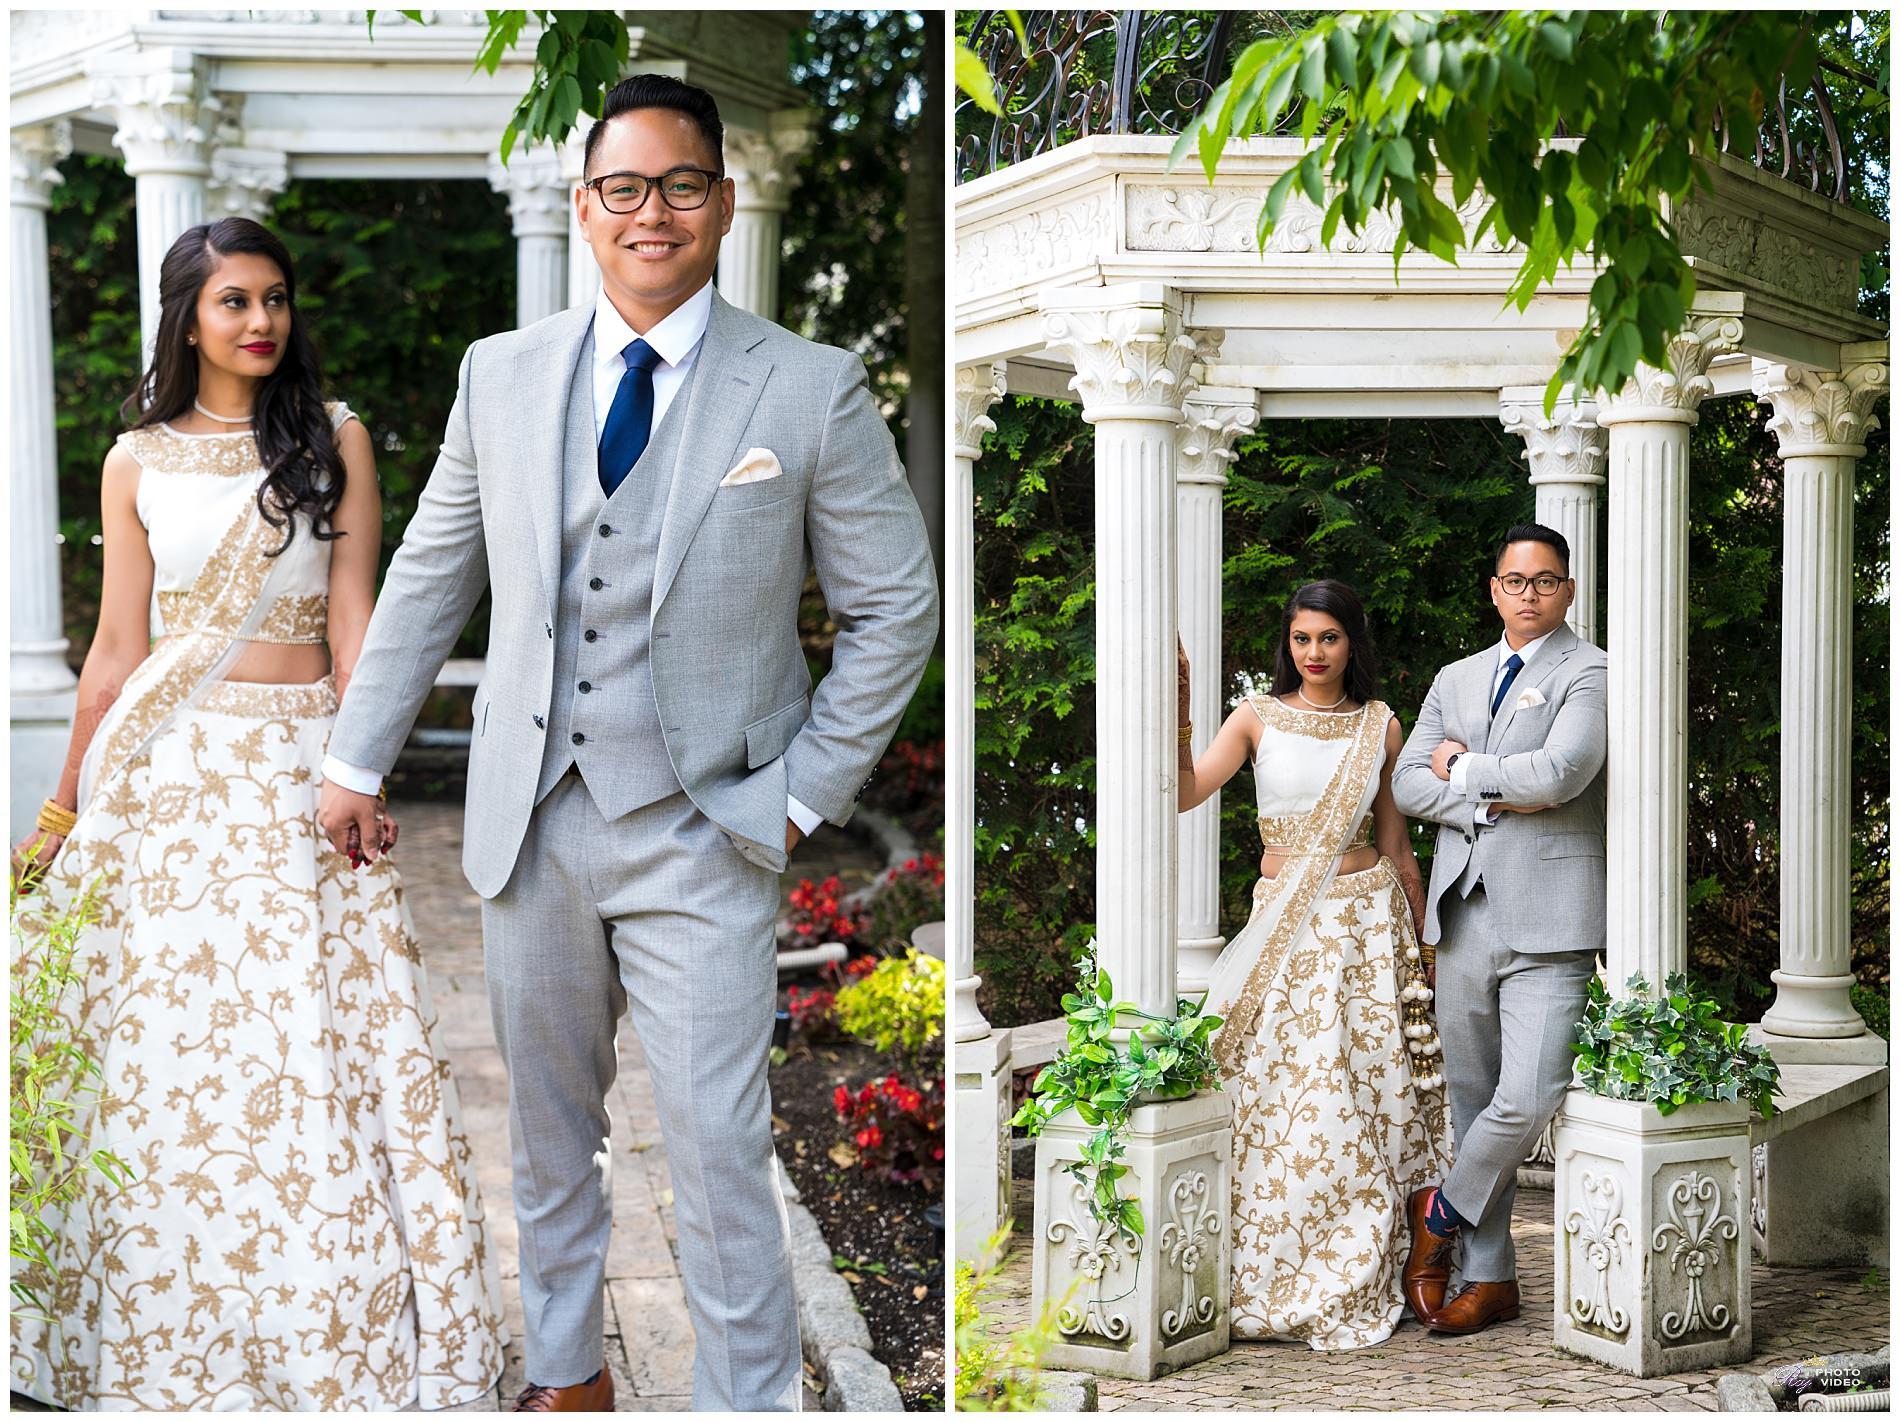 Royal-Manor-Garfield-NJ-Christian-Wedding-Ceremony-Khusbu-Jeff-18.jpg